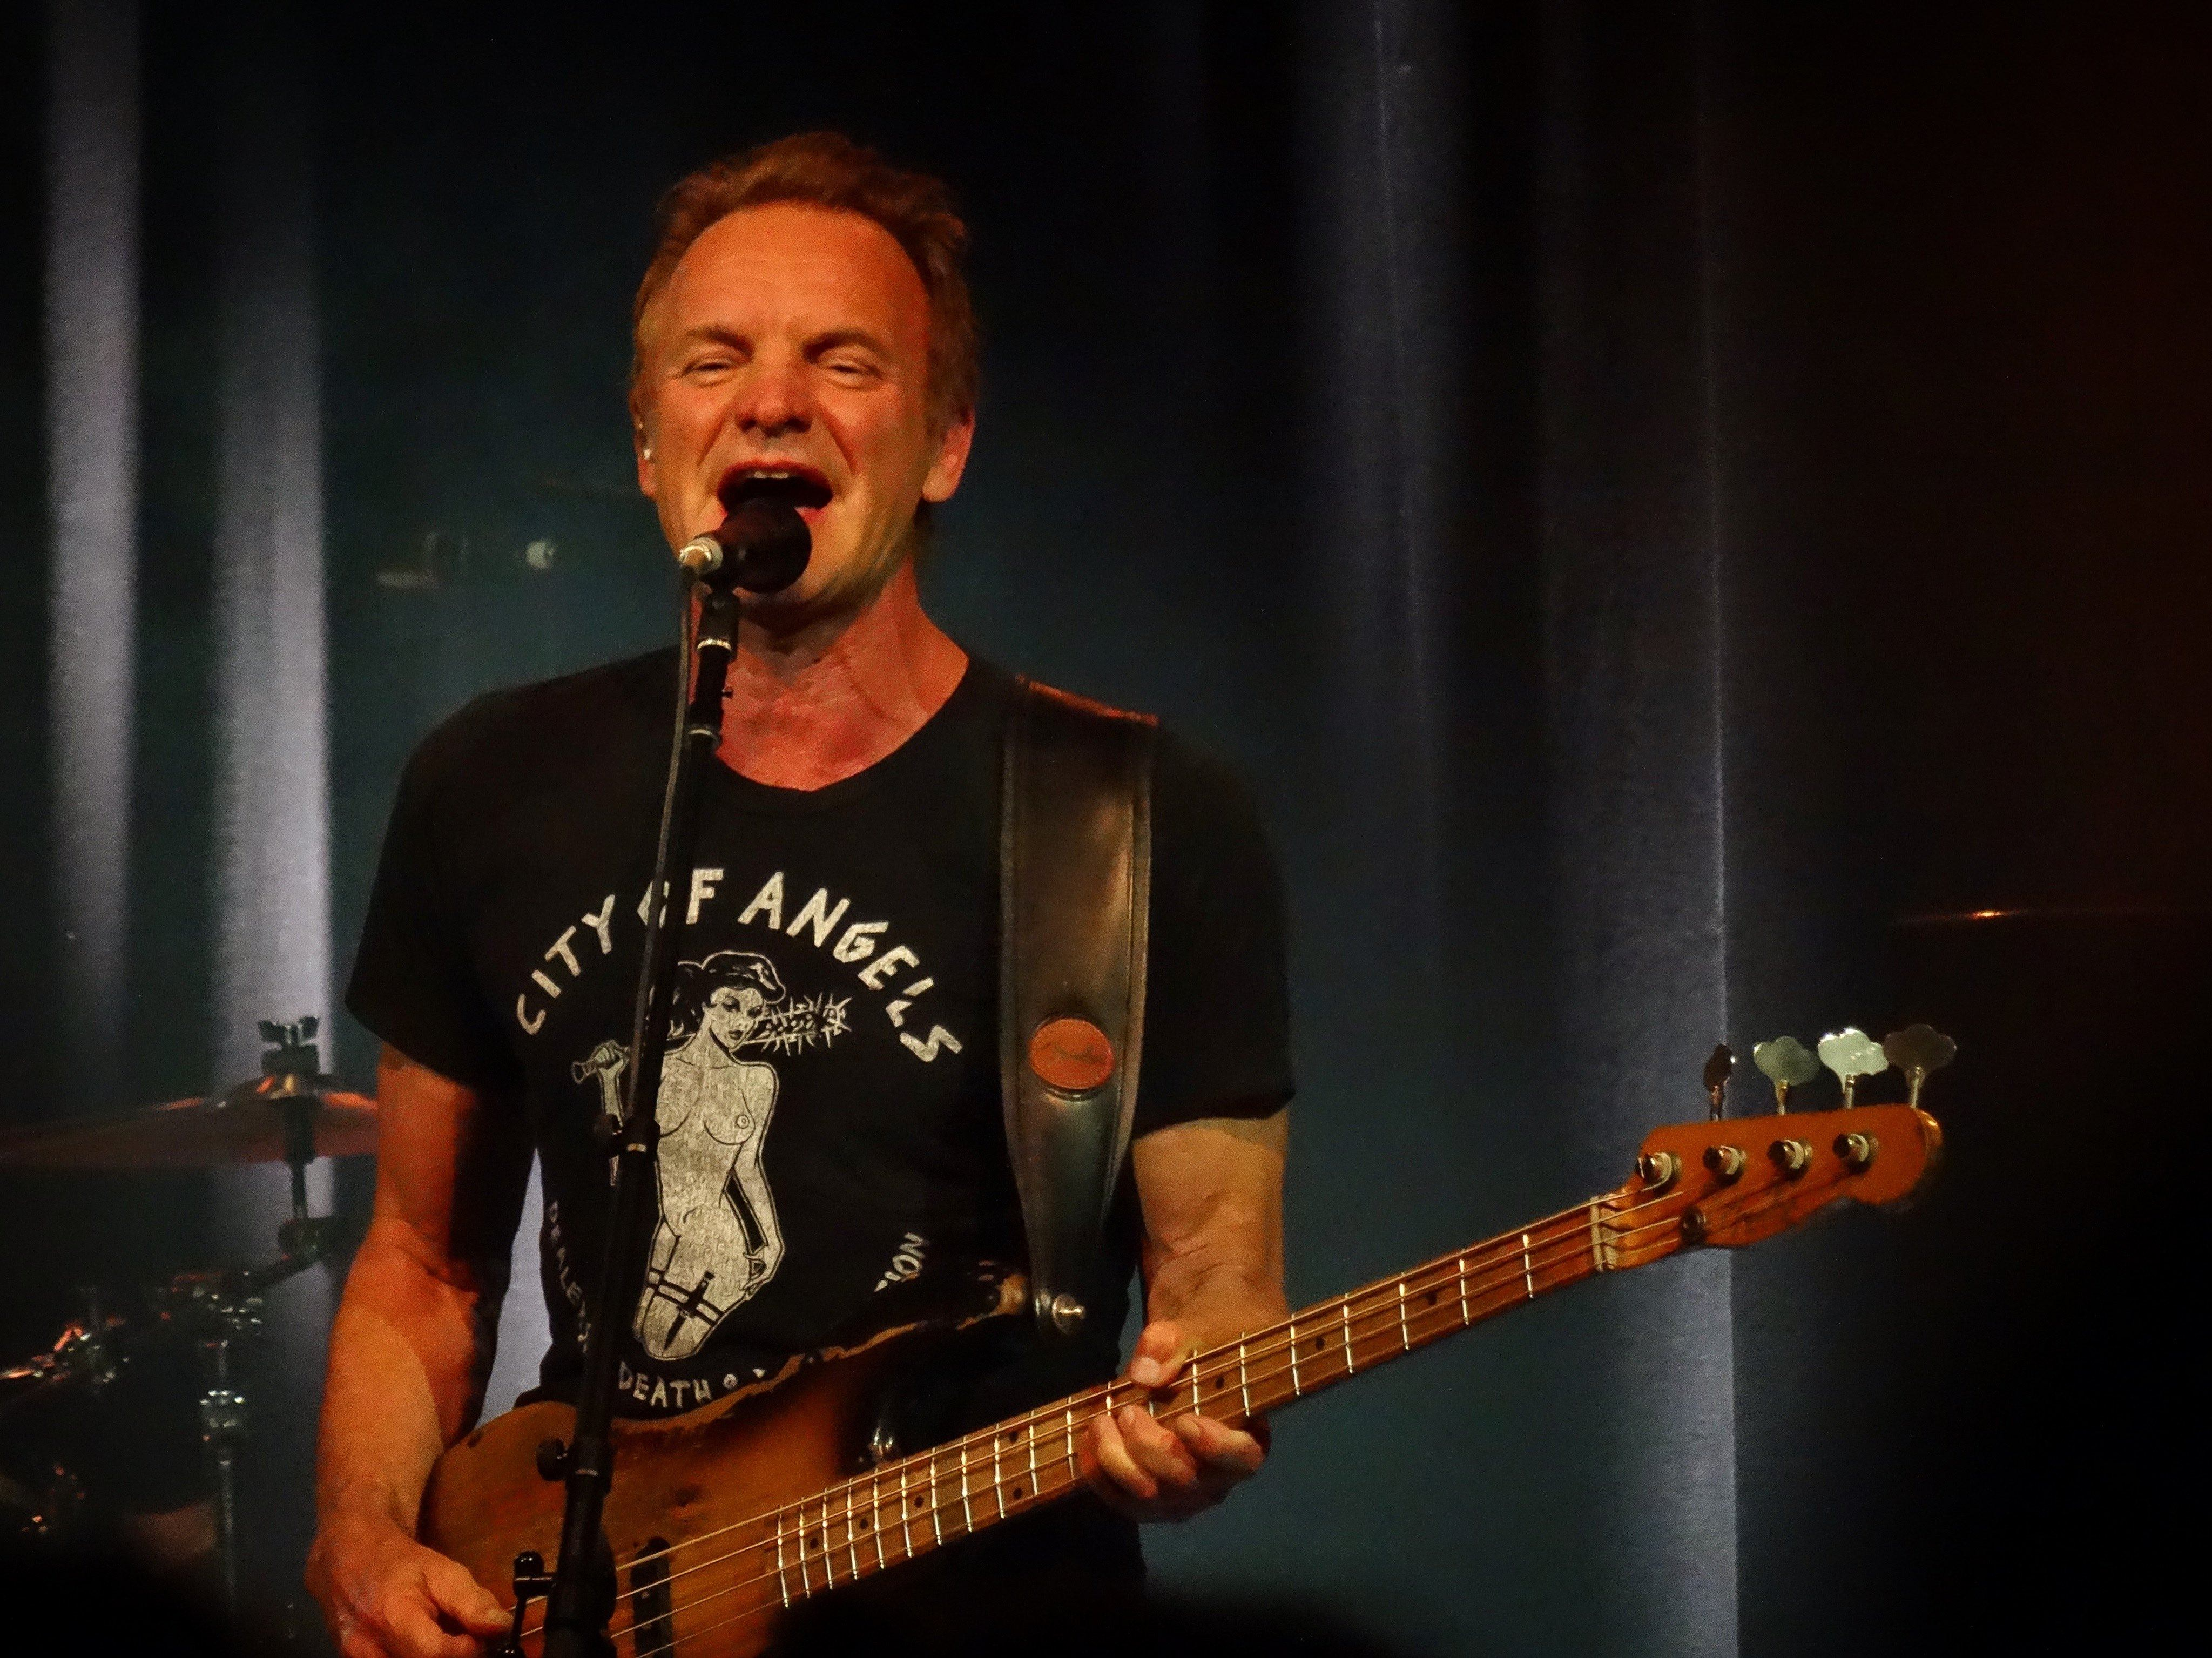 Englishman in Vancouver: Sting kicks off club tour at Commodore Ballroom